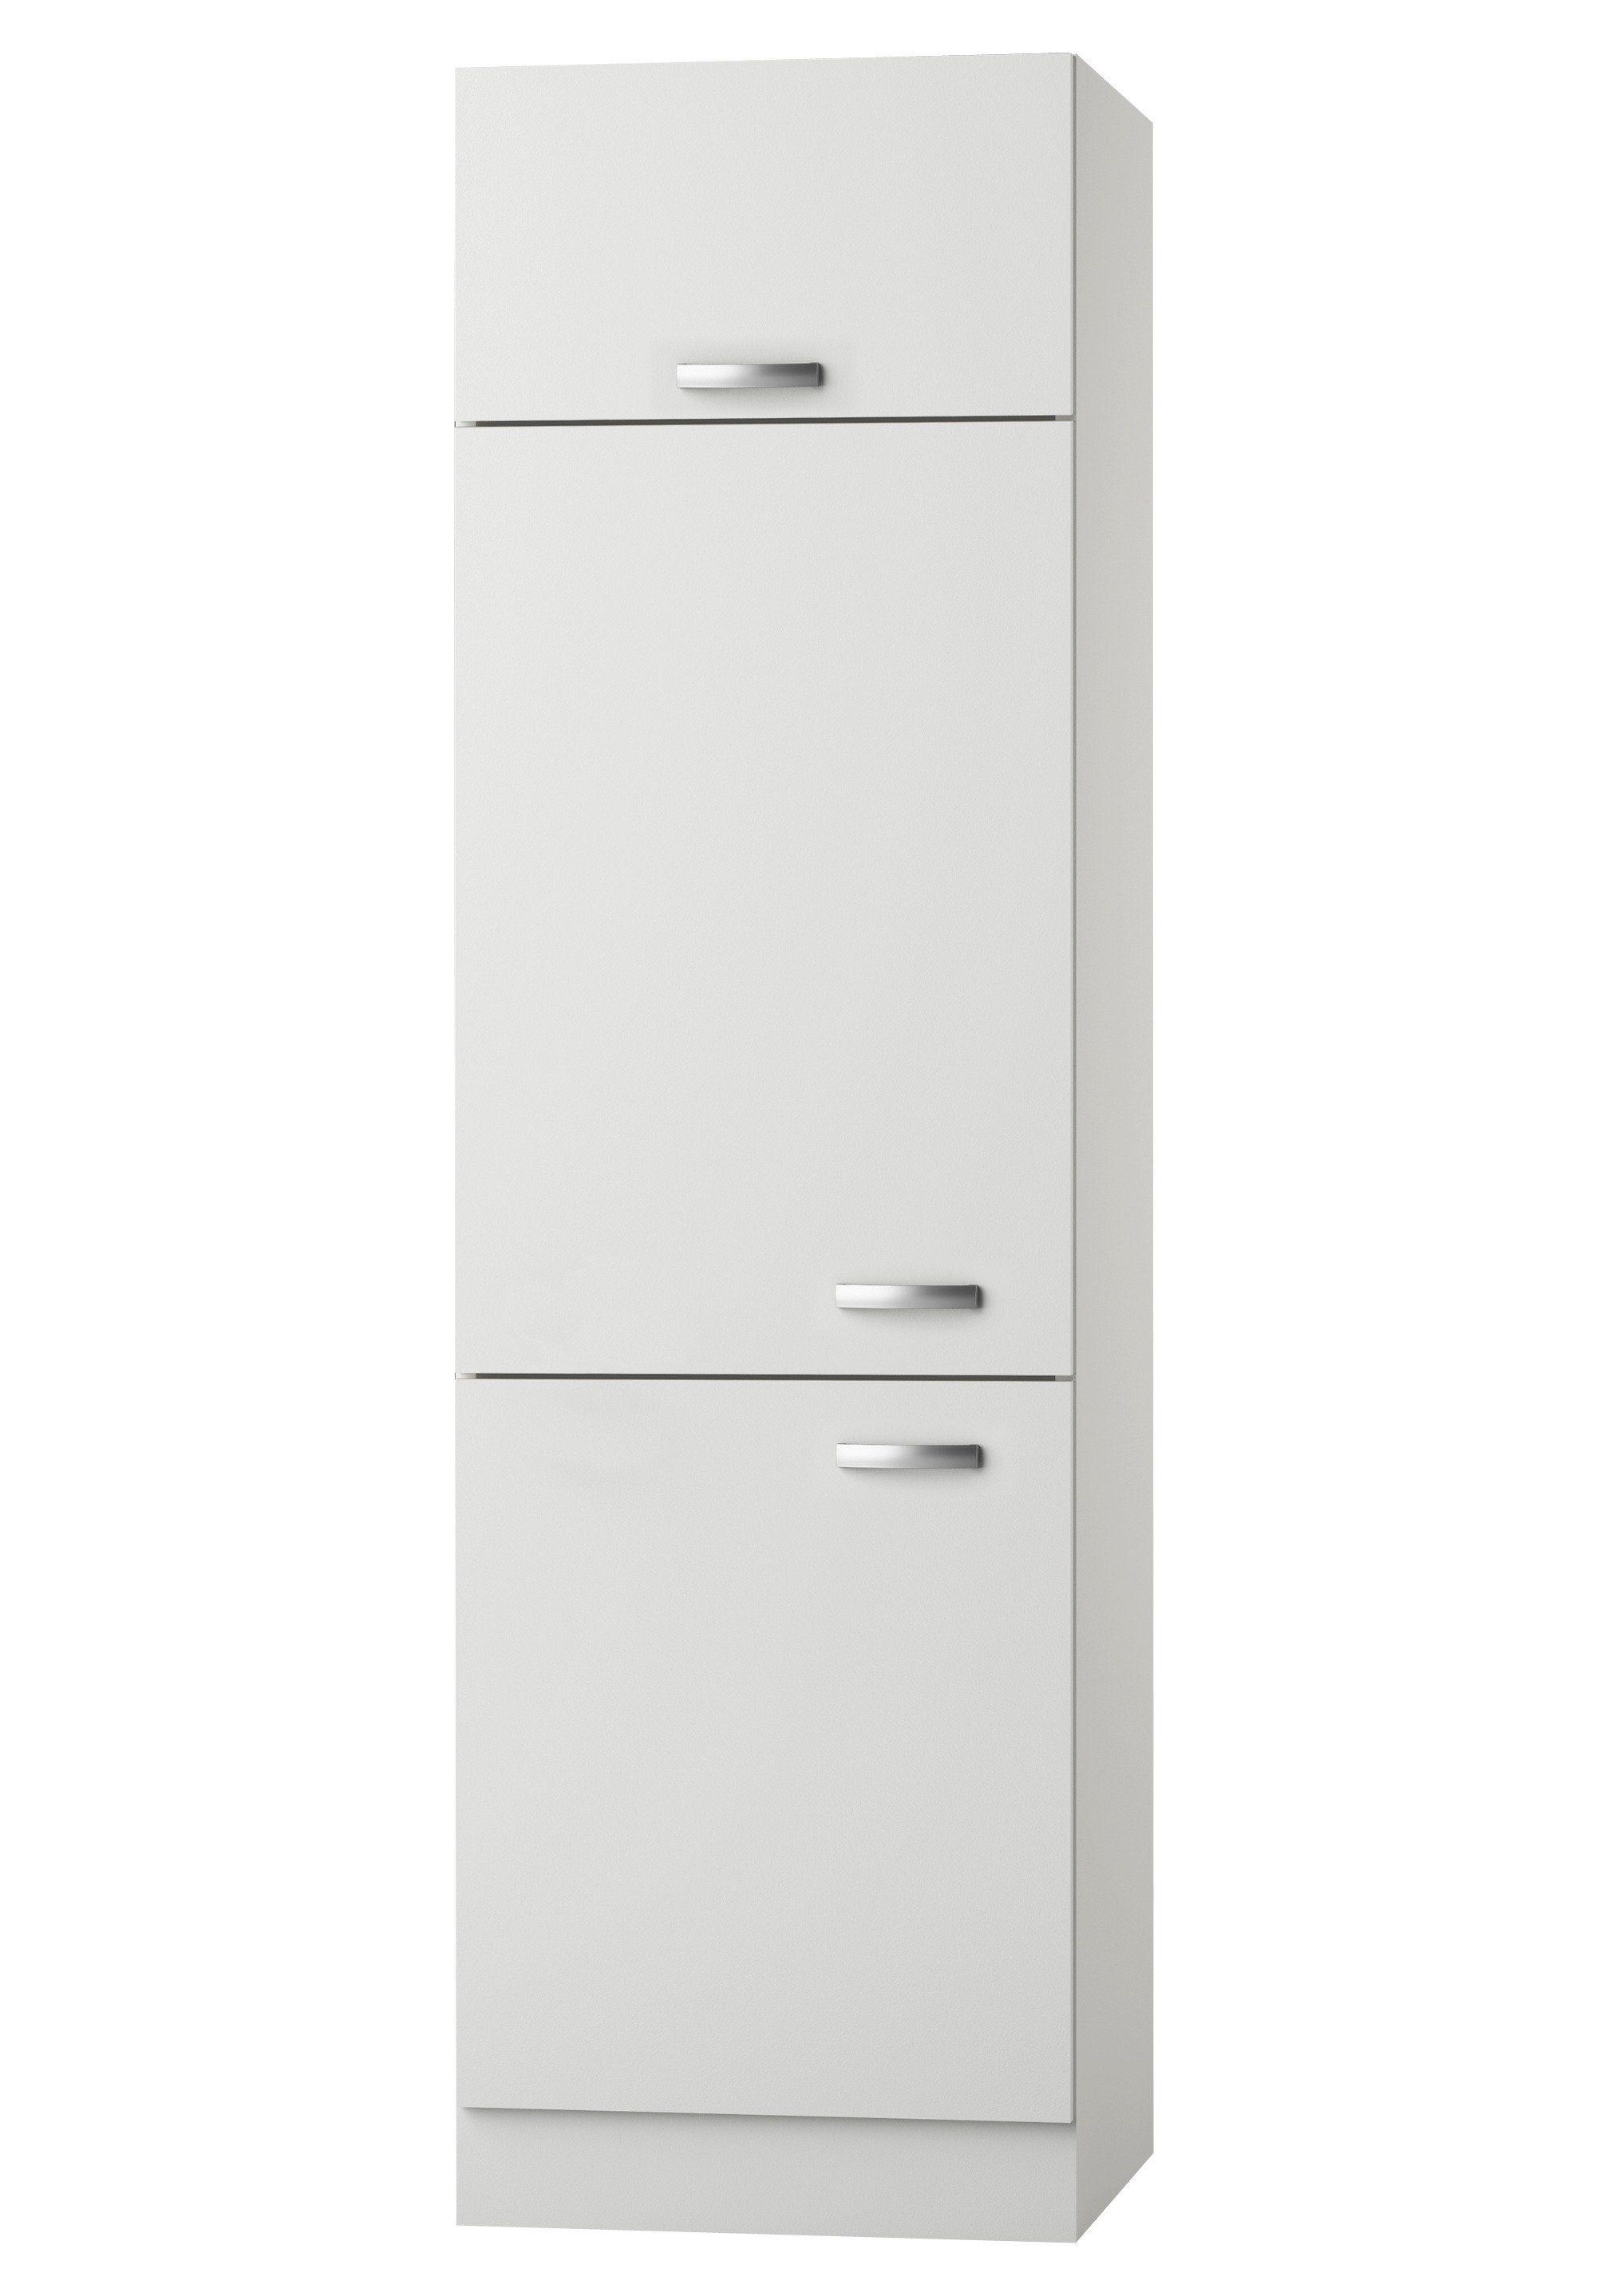 Optifit Kühlumbauschrank »Lagos«, Höhe 206,8 cm